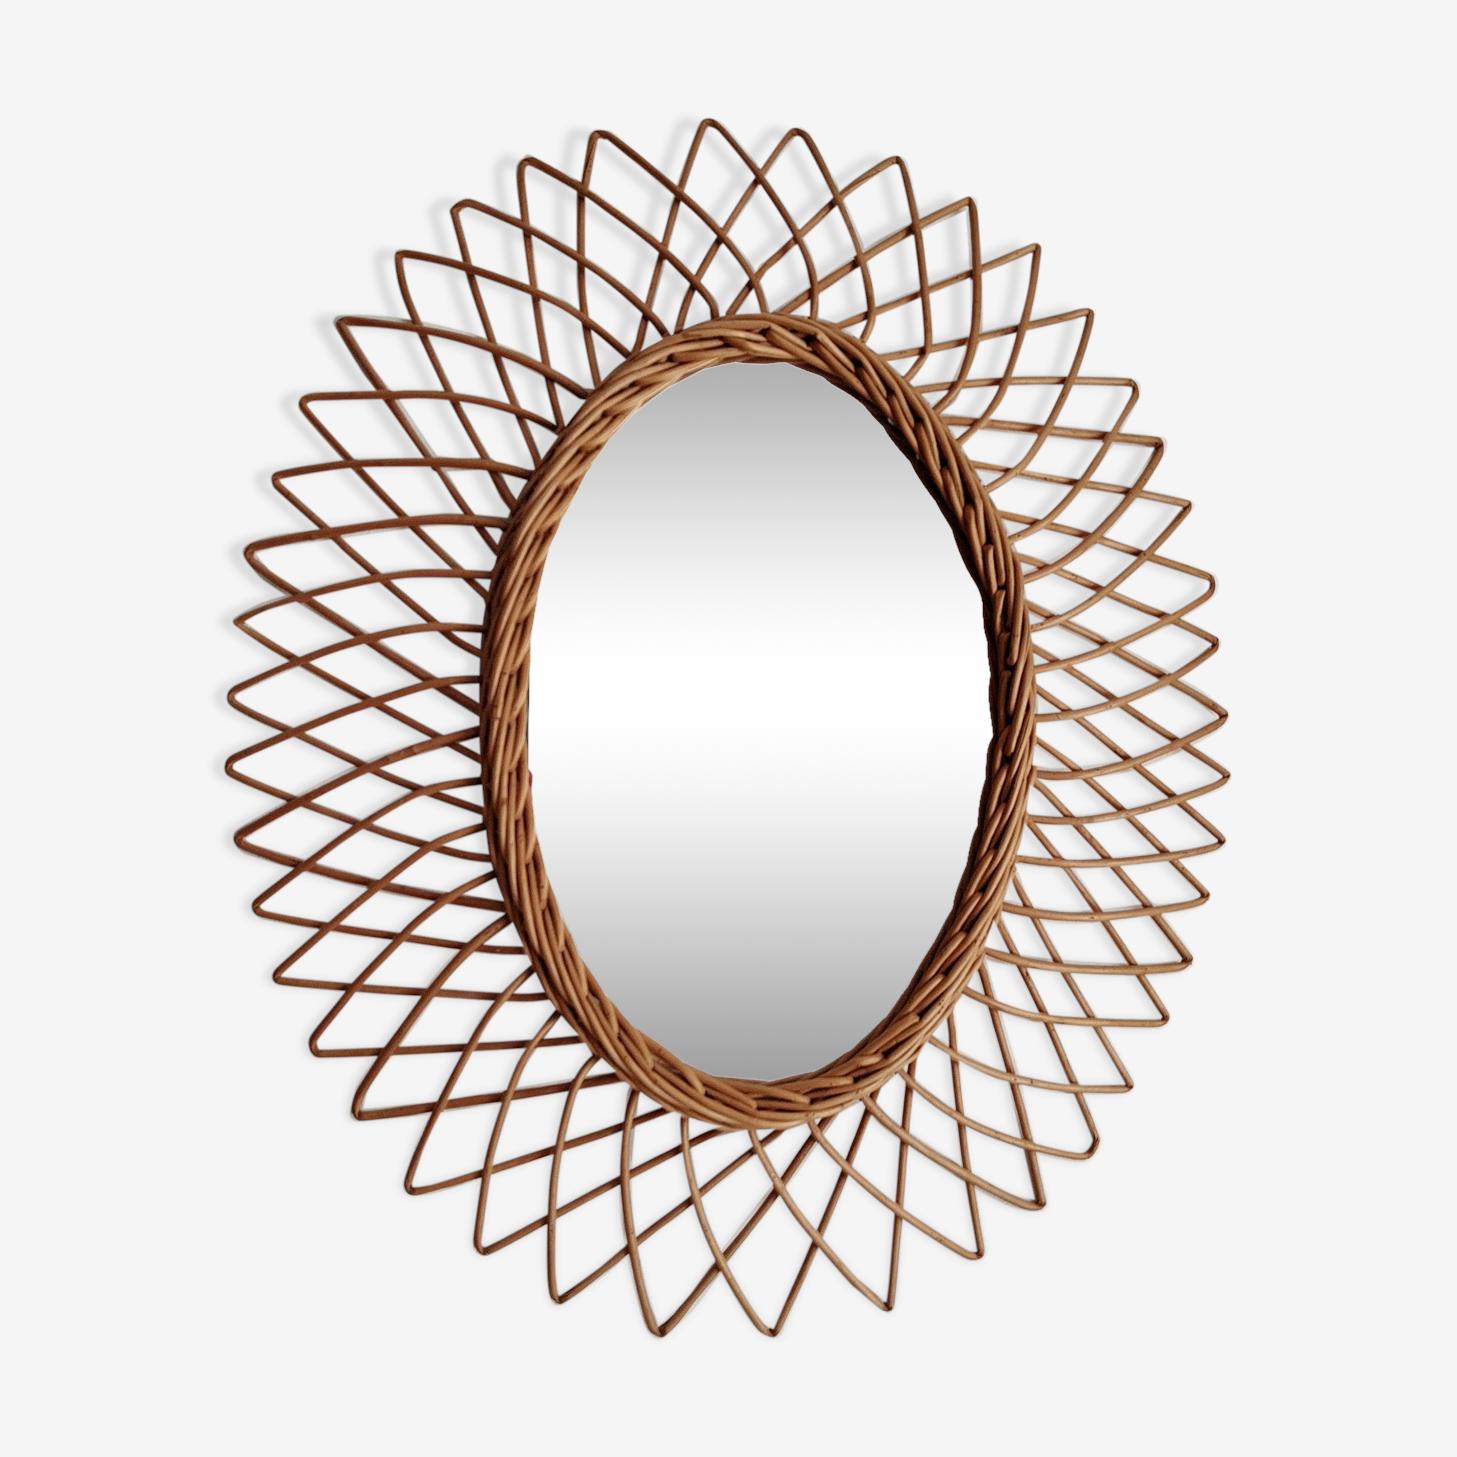 Oval mirror 41x50cm